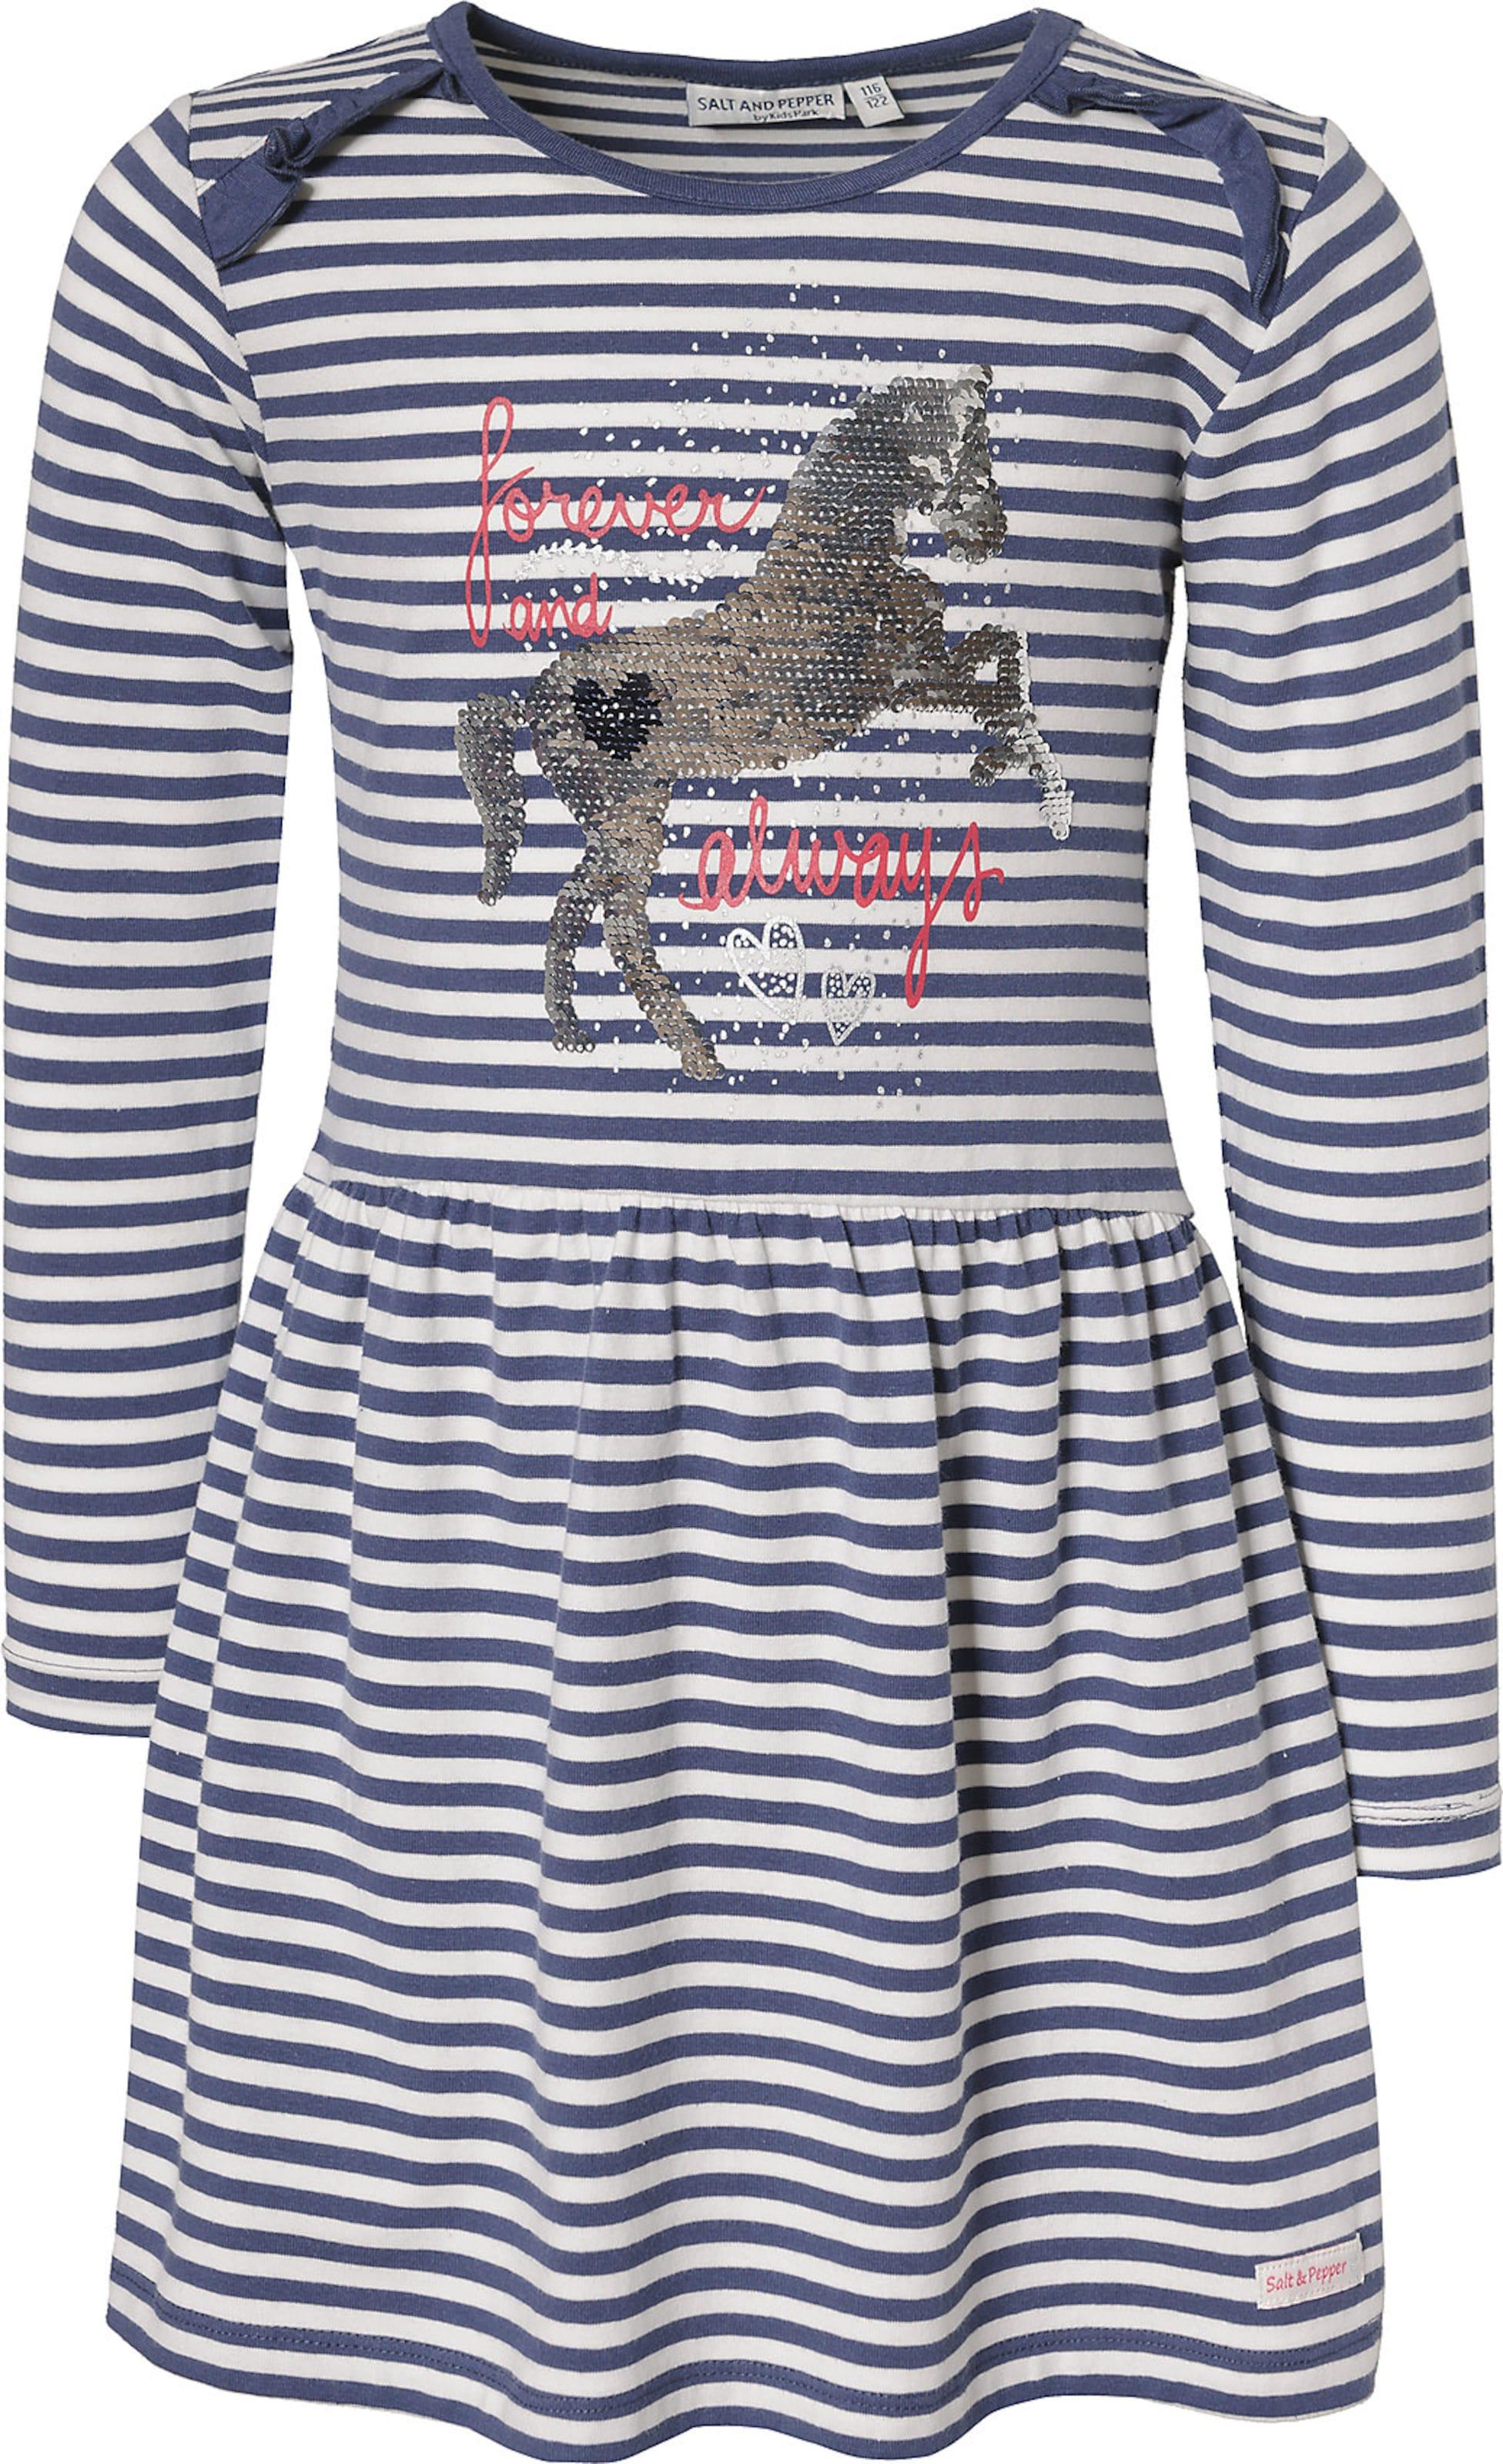 Kinder,  Mädchen,  Kinder SALT AND PEPPER Kleid blau,  weiß | 04061386044664